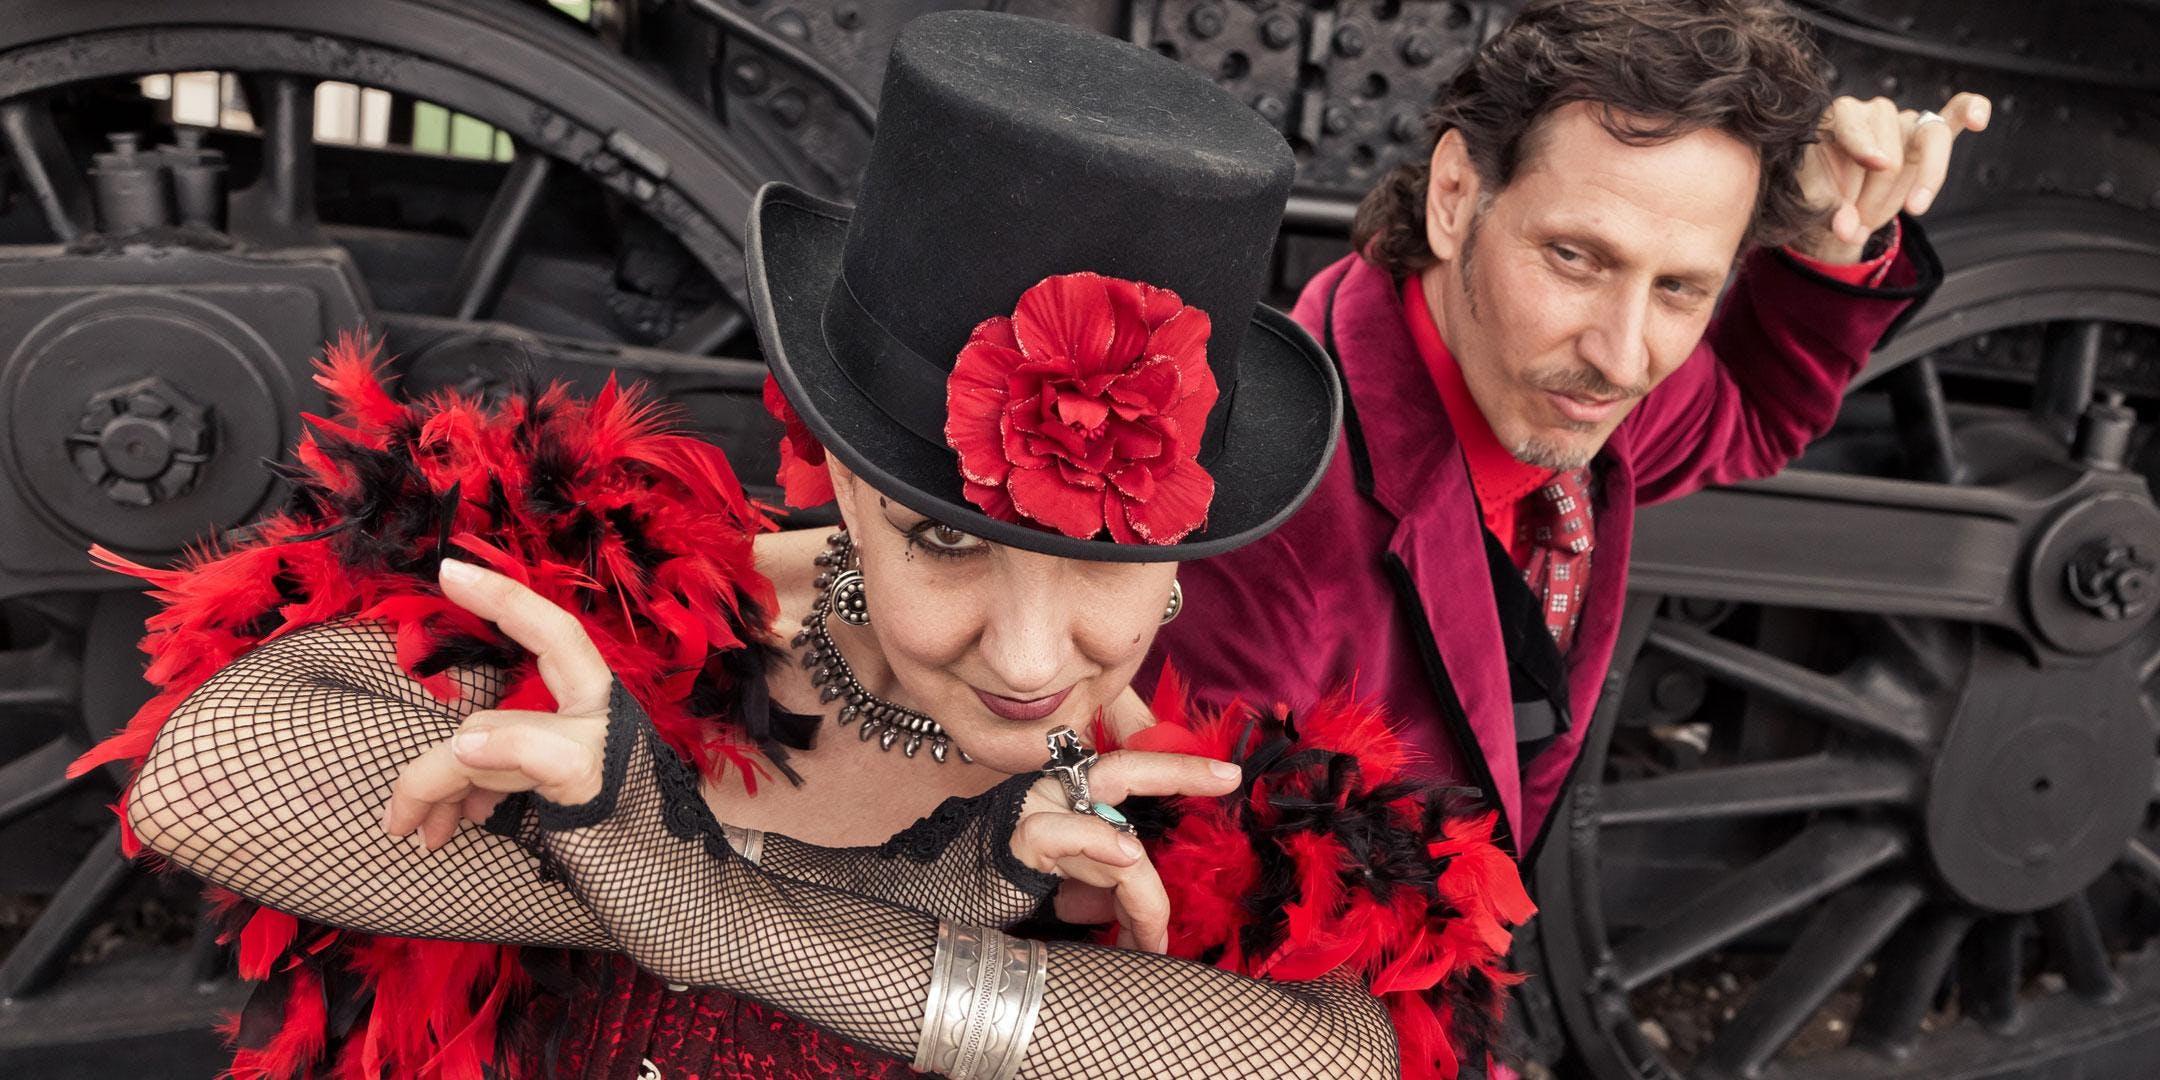 Carnival of Illusion in Mesa: Magic, Mystery & Oooh La La!